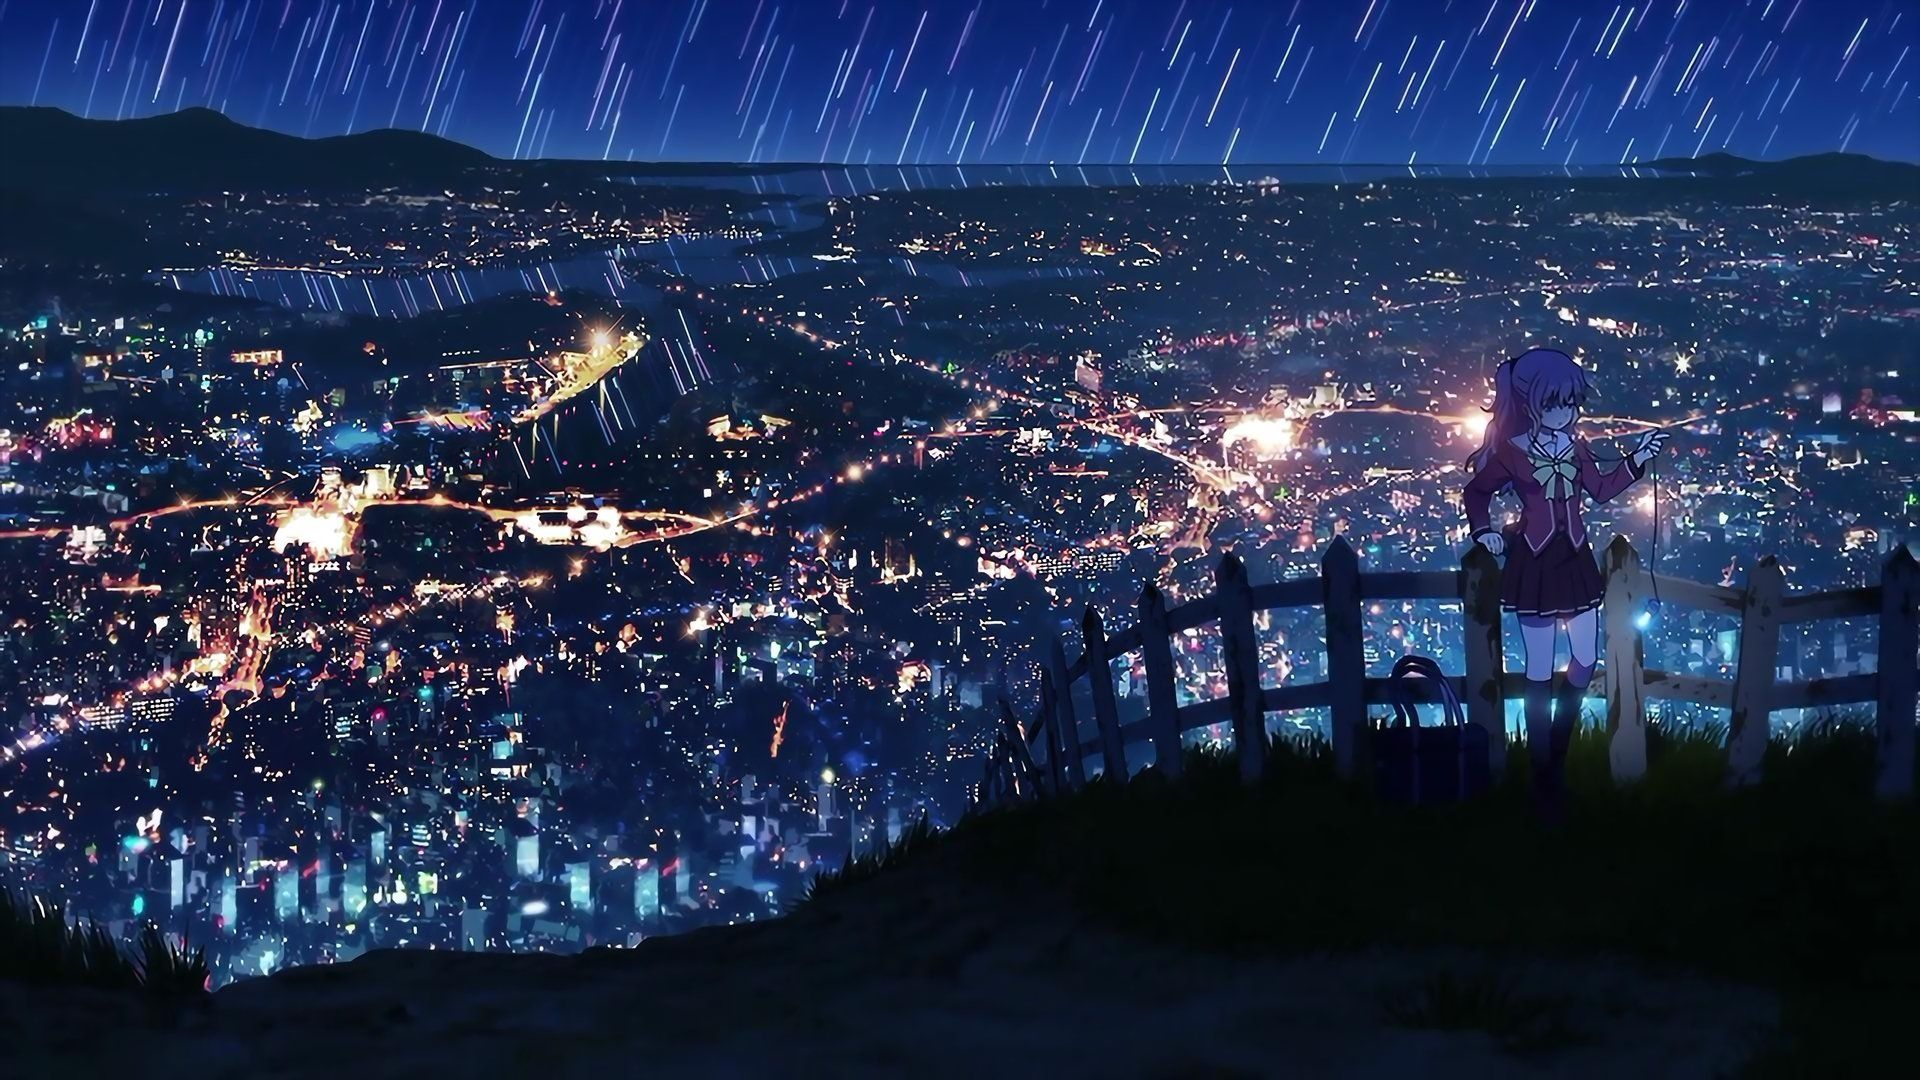 30 Wallpapers De Anime Para Otakus Full Hd Paisajes Anime Fondos De Pantalla Pc Fondo De Pantalla De Anime